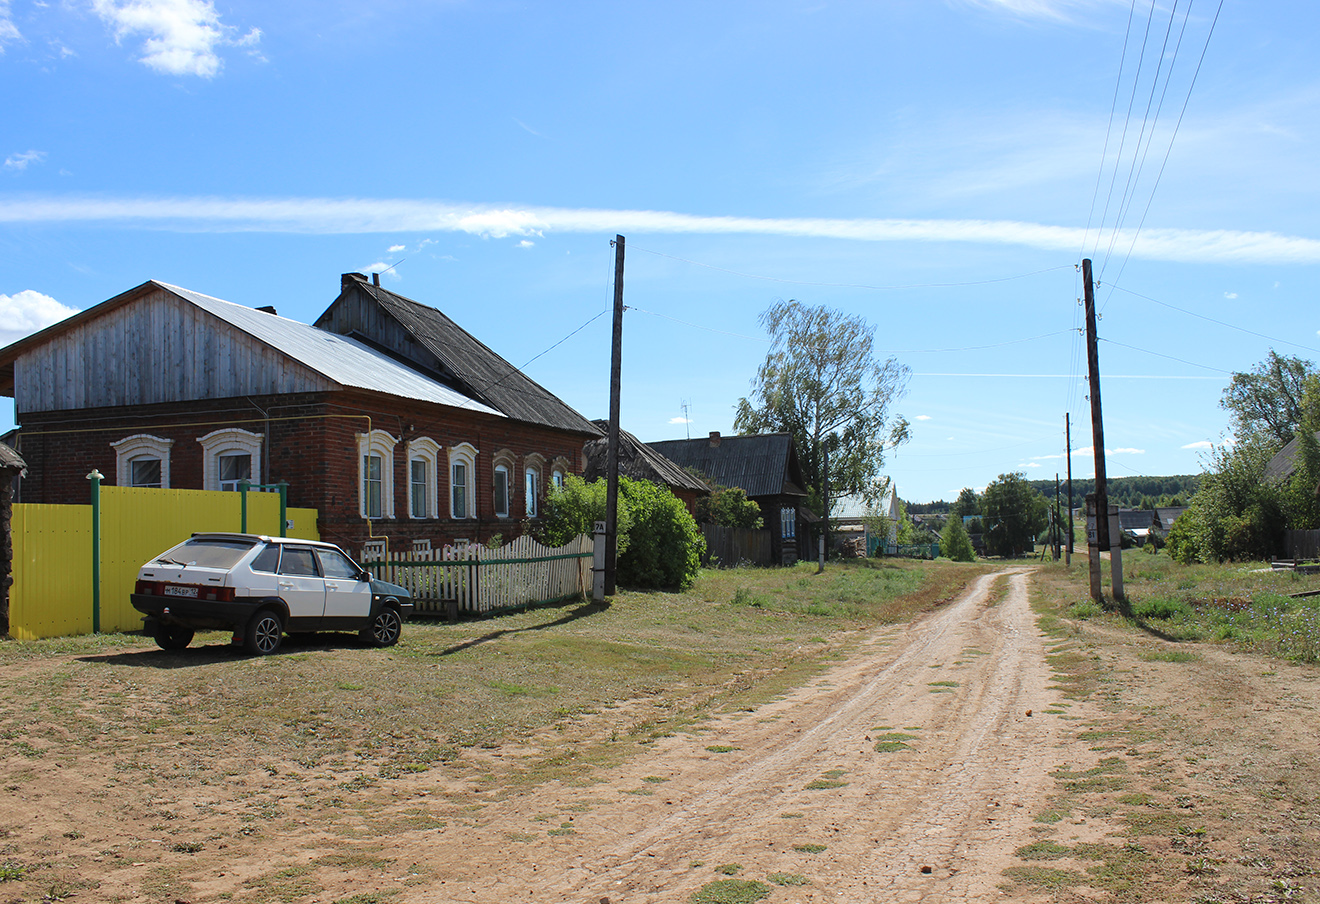 Главная улица деревни Мари-Шолнер. Фото: 7x7-journal.ru